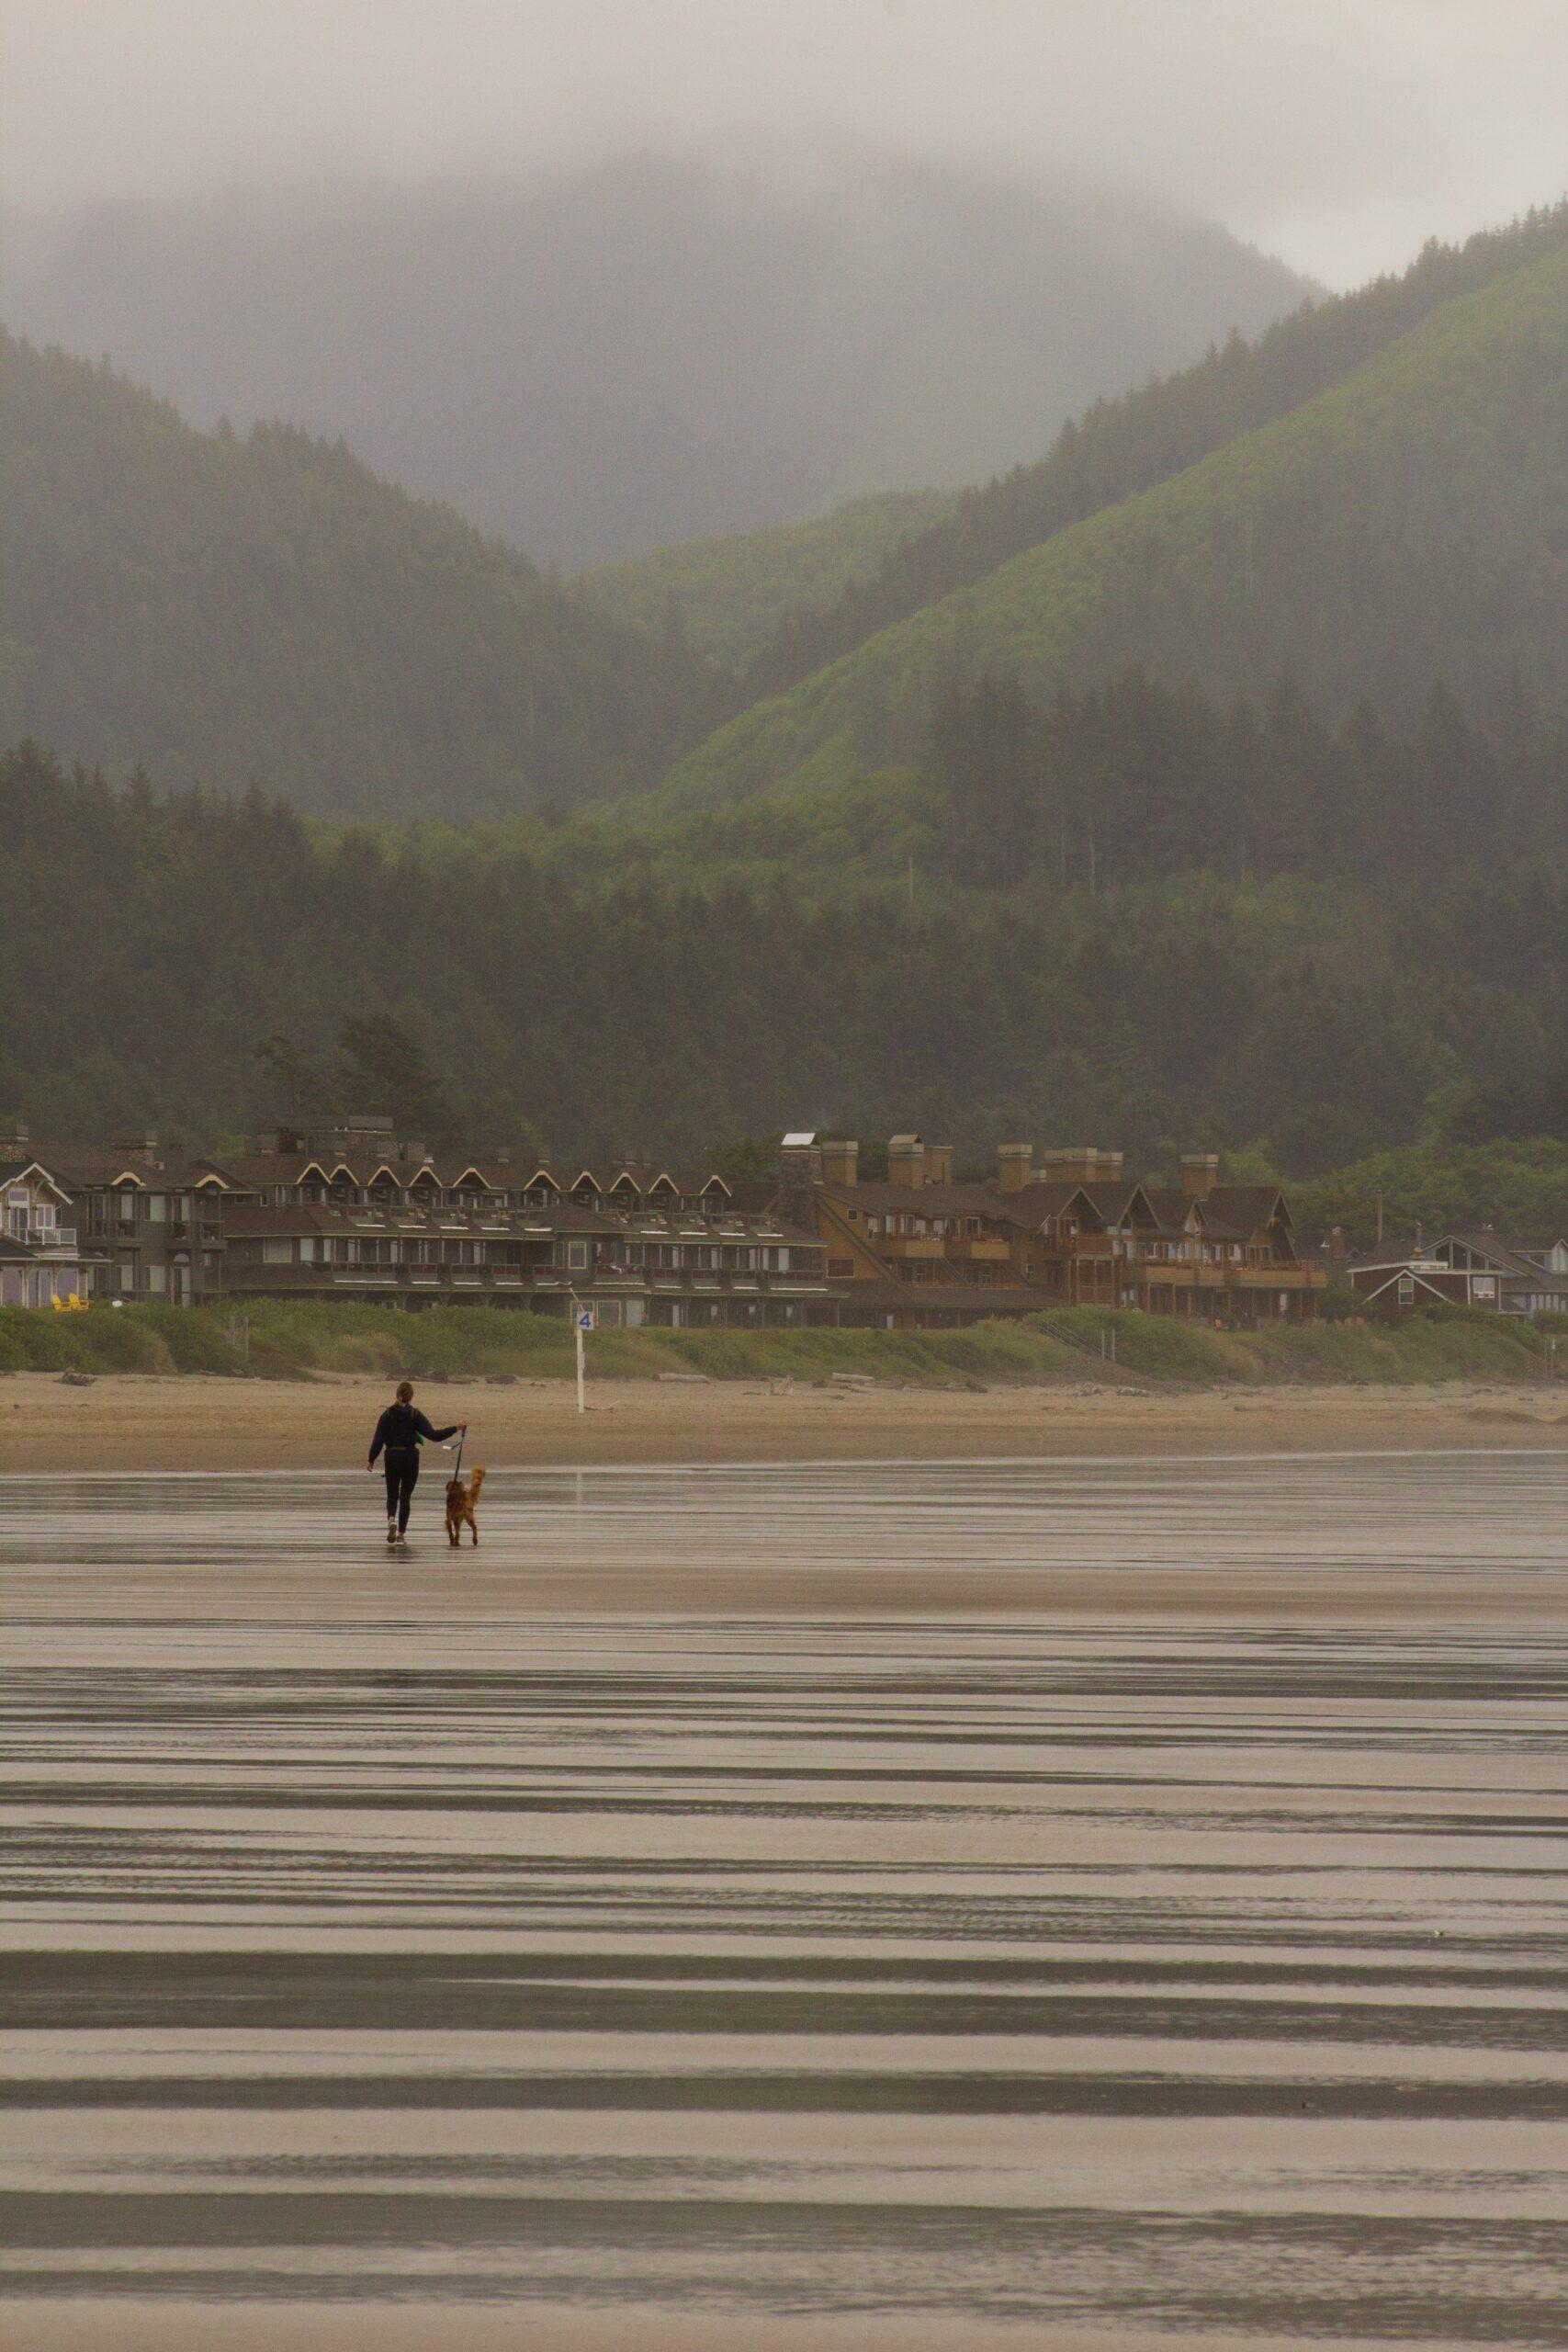 ryan-stone-seaside dog walker am walk in fog-unsplash